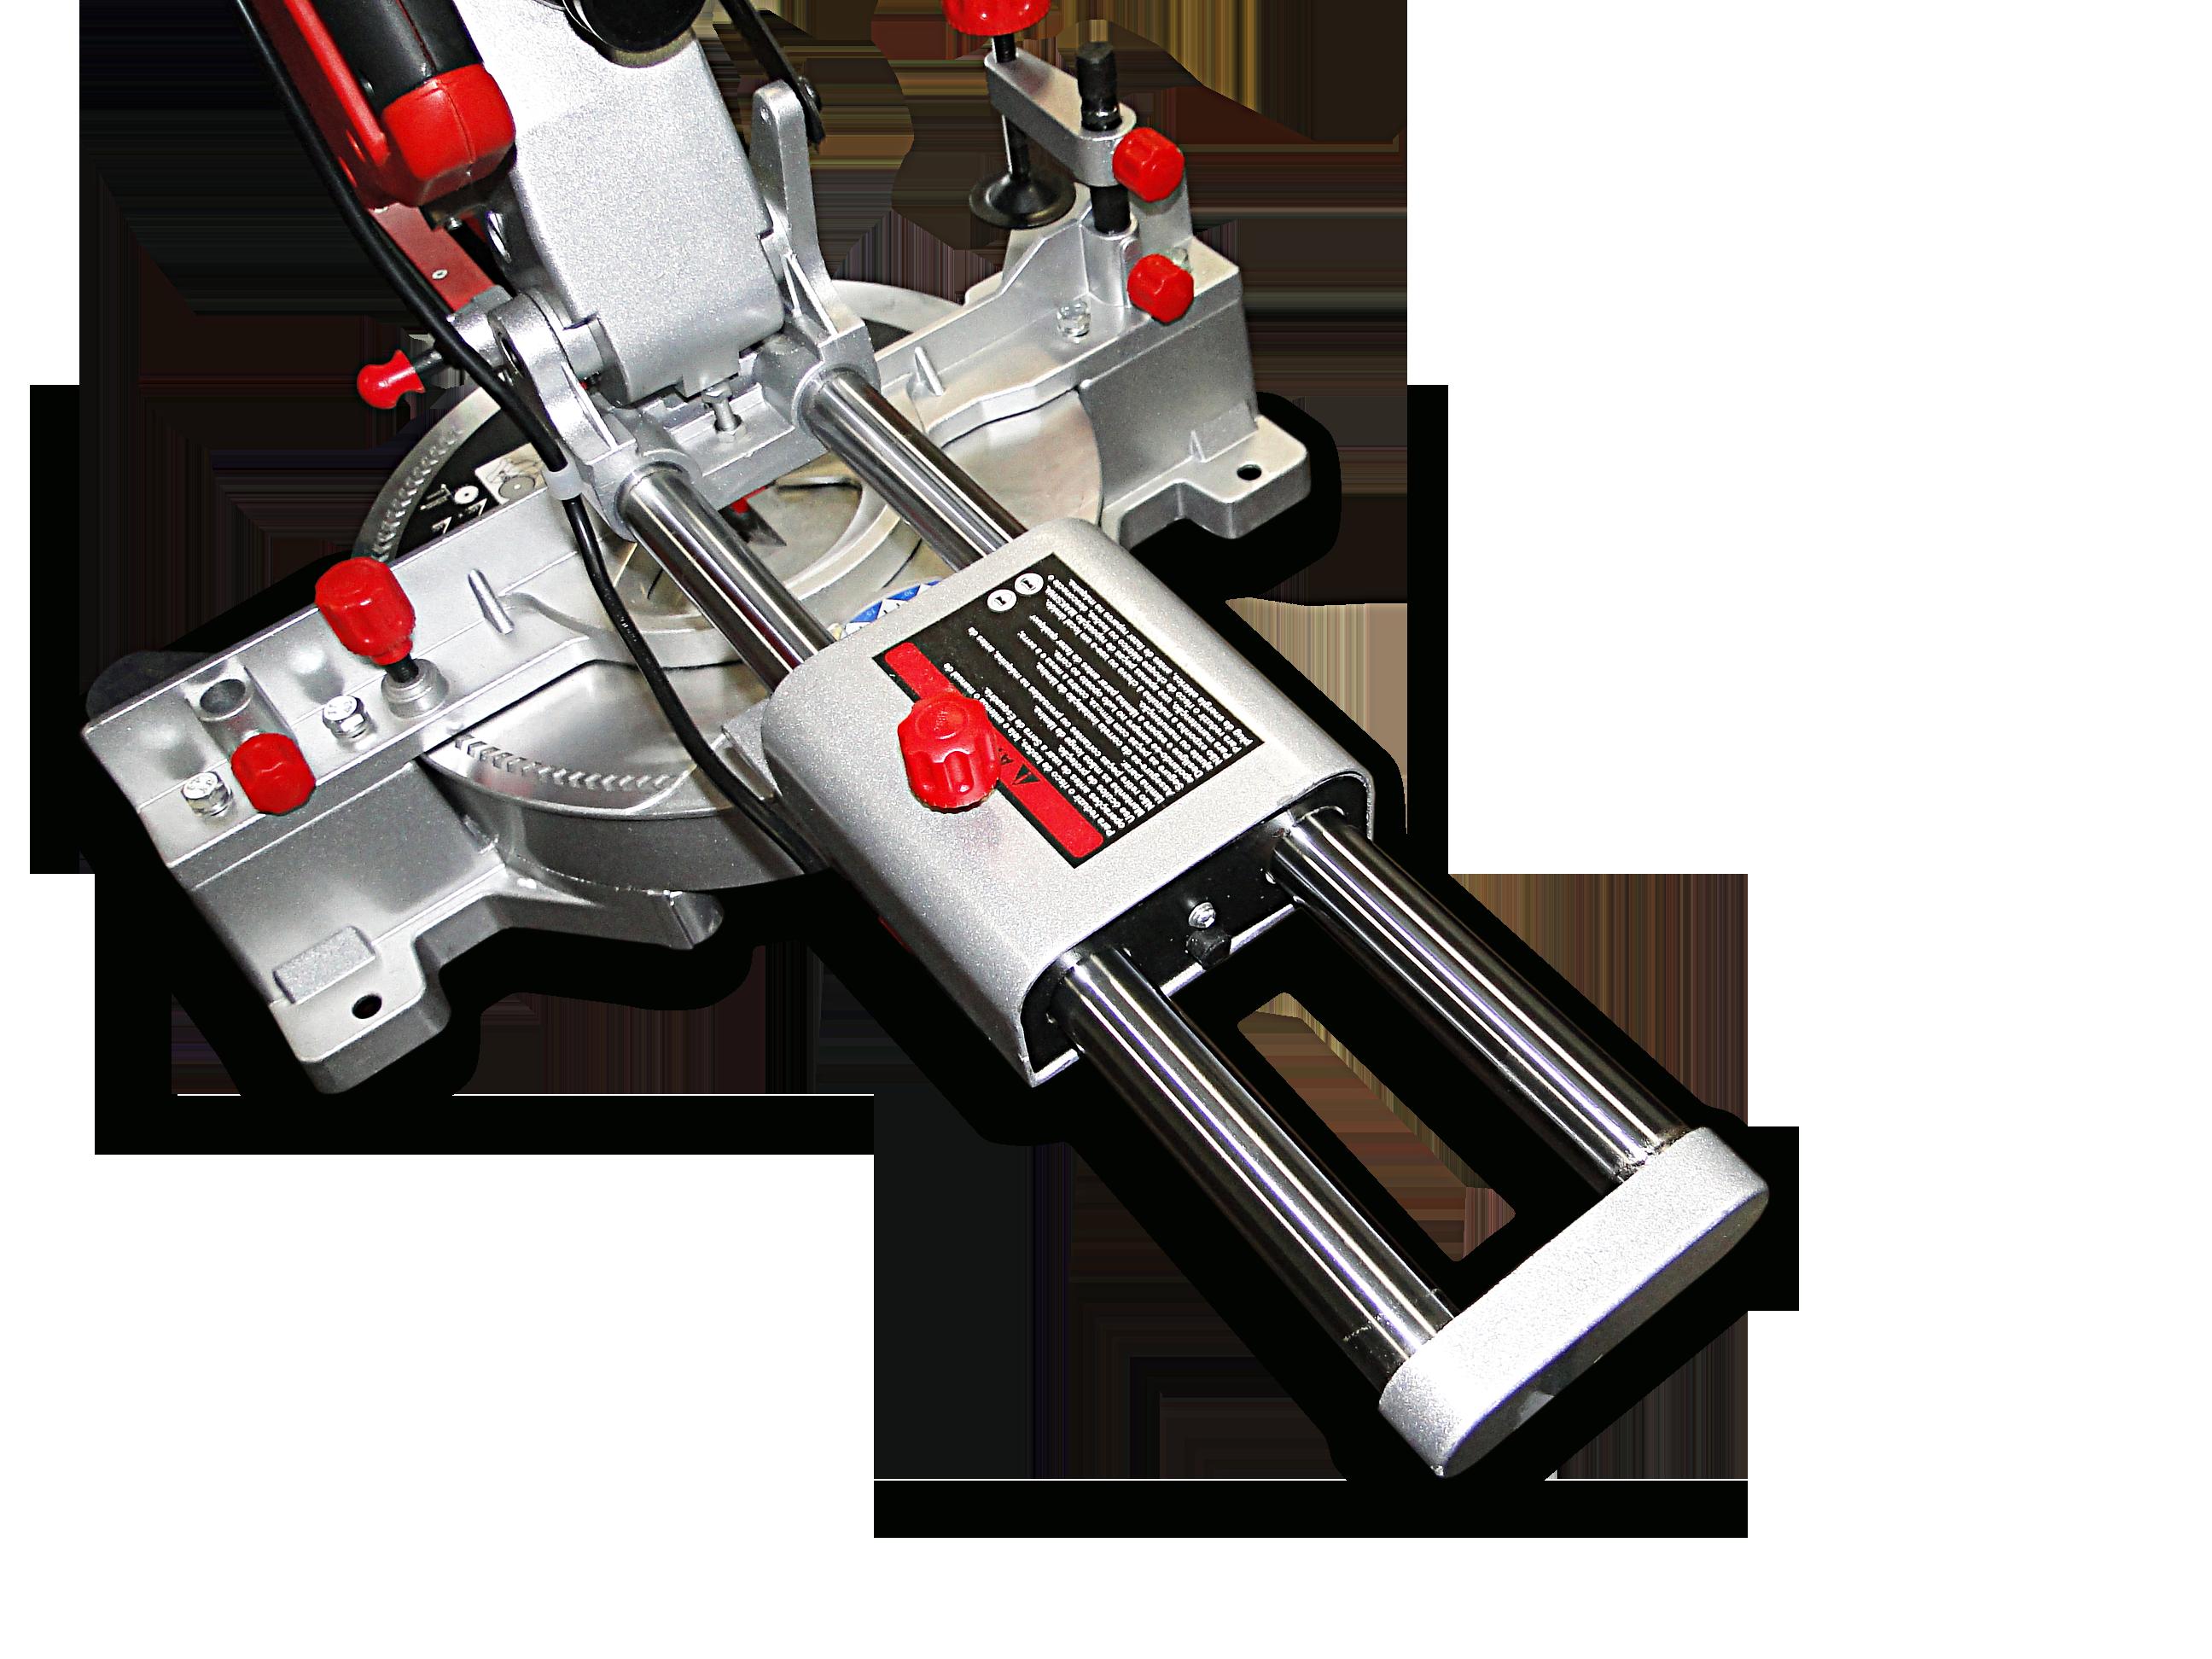 miter-saw-mk300i (4)